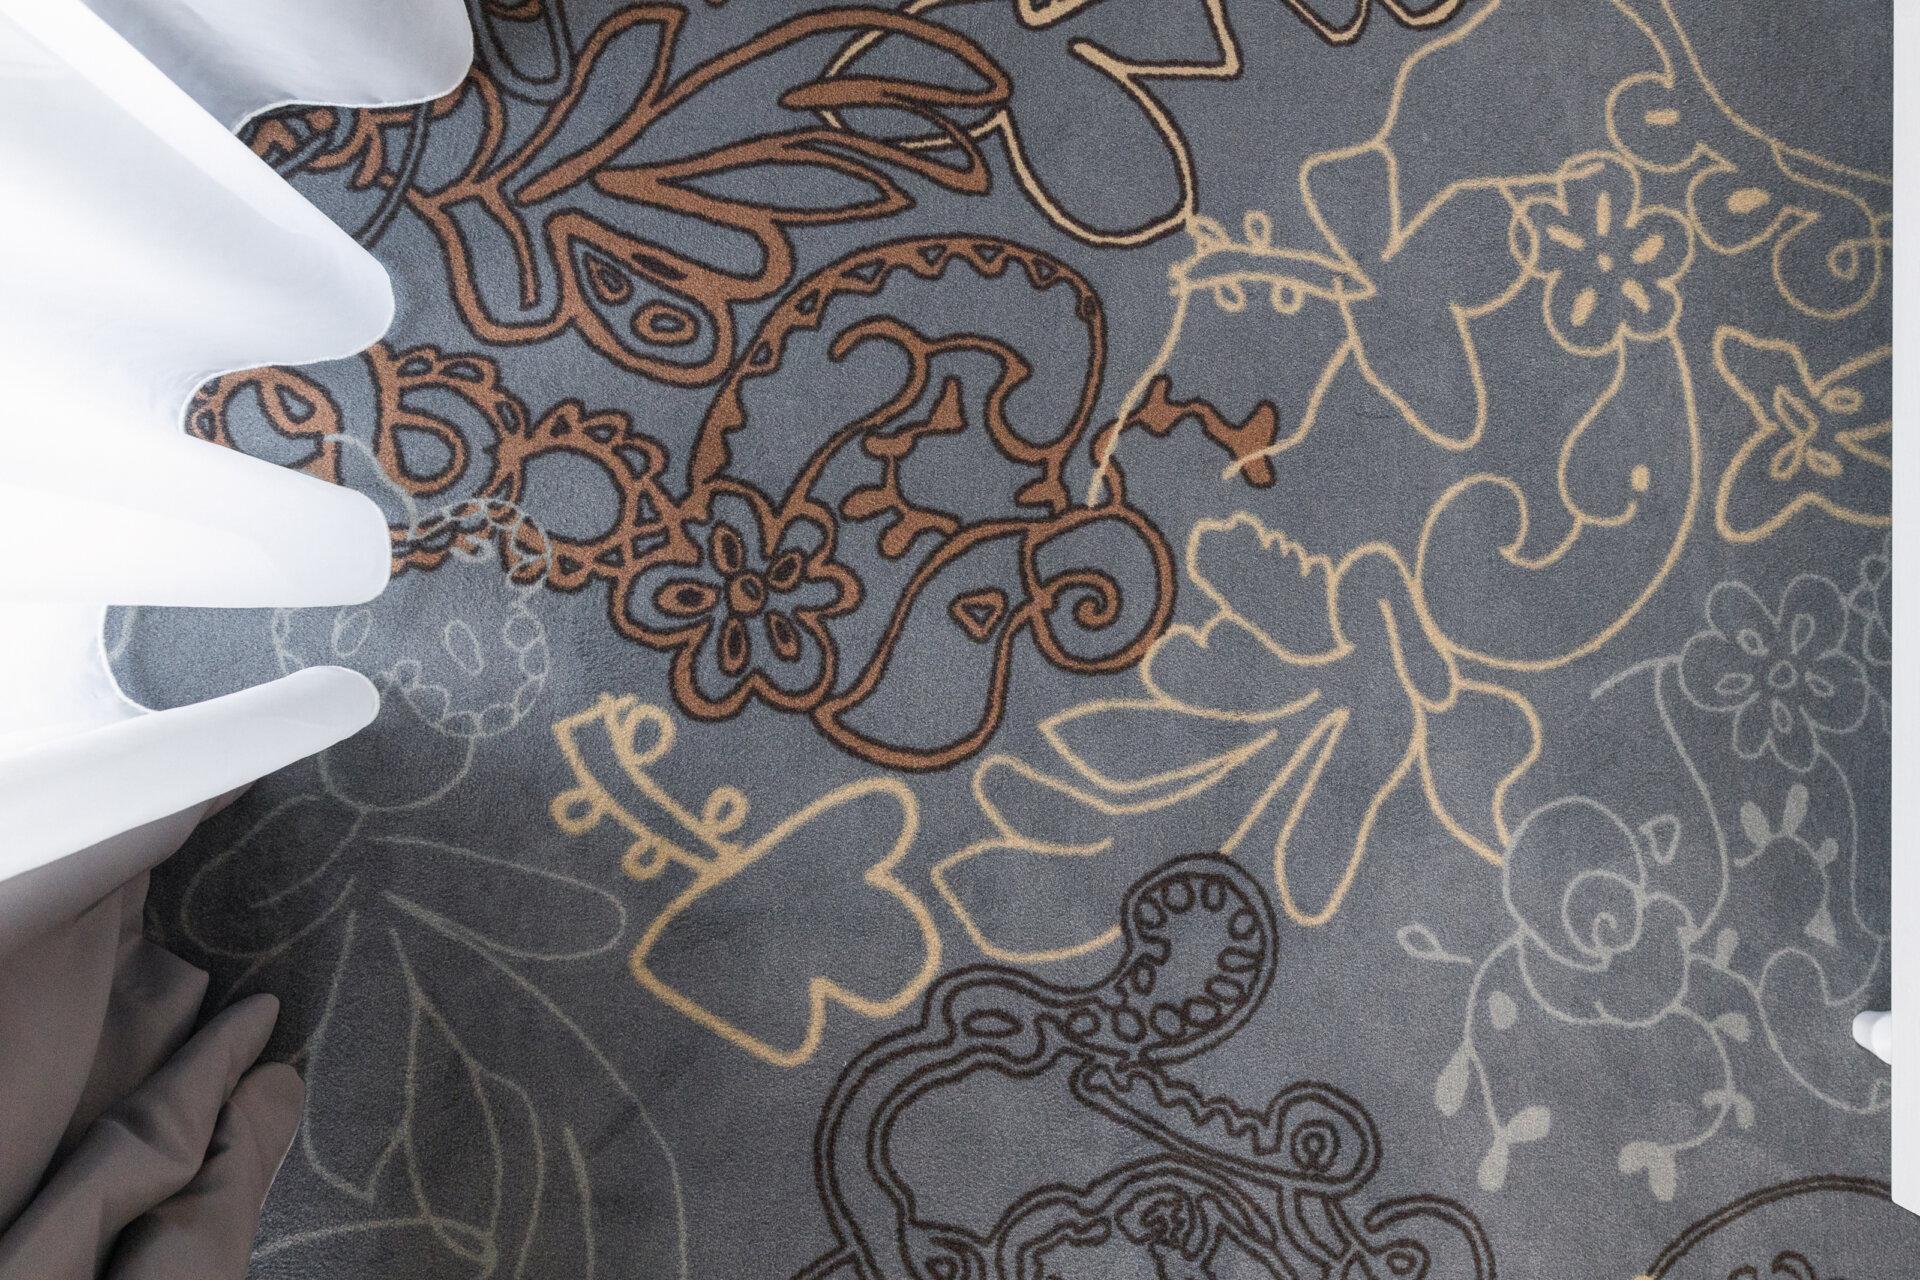 20210524-carpet&more-mamaia-hotel-scapino-junior-by-hugmedia-030